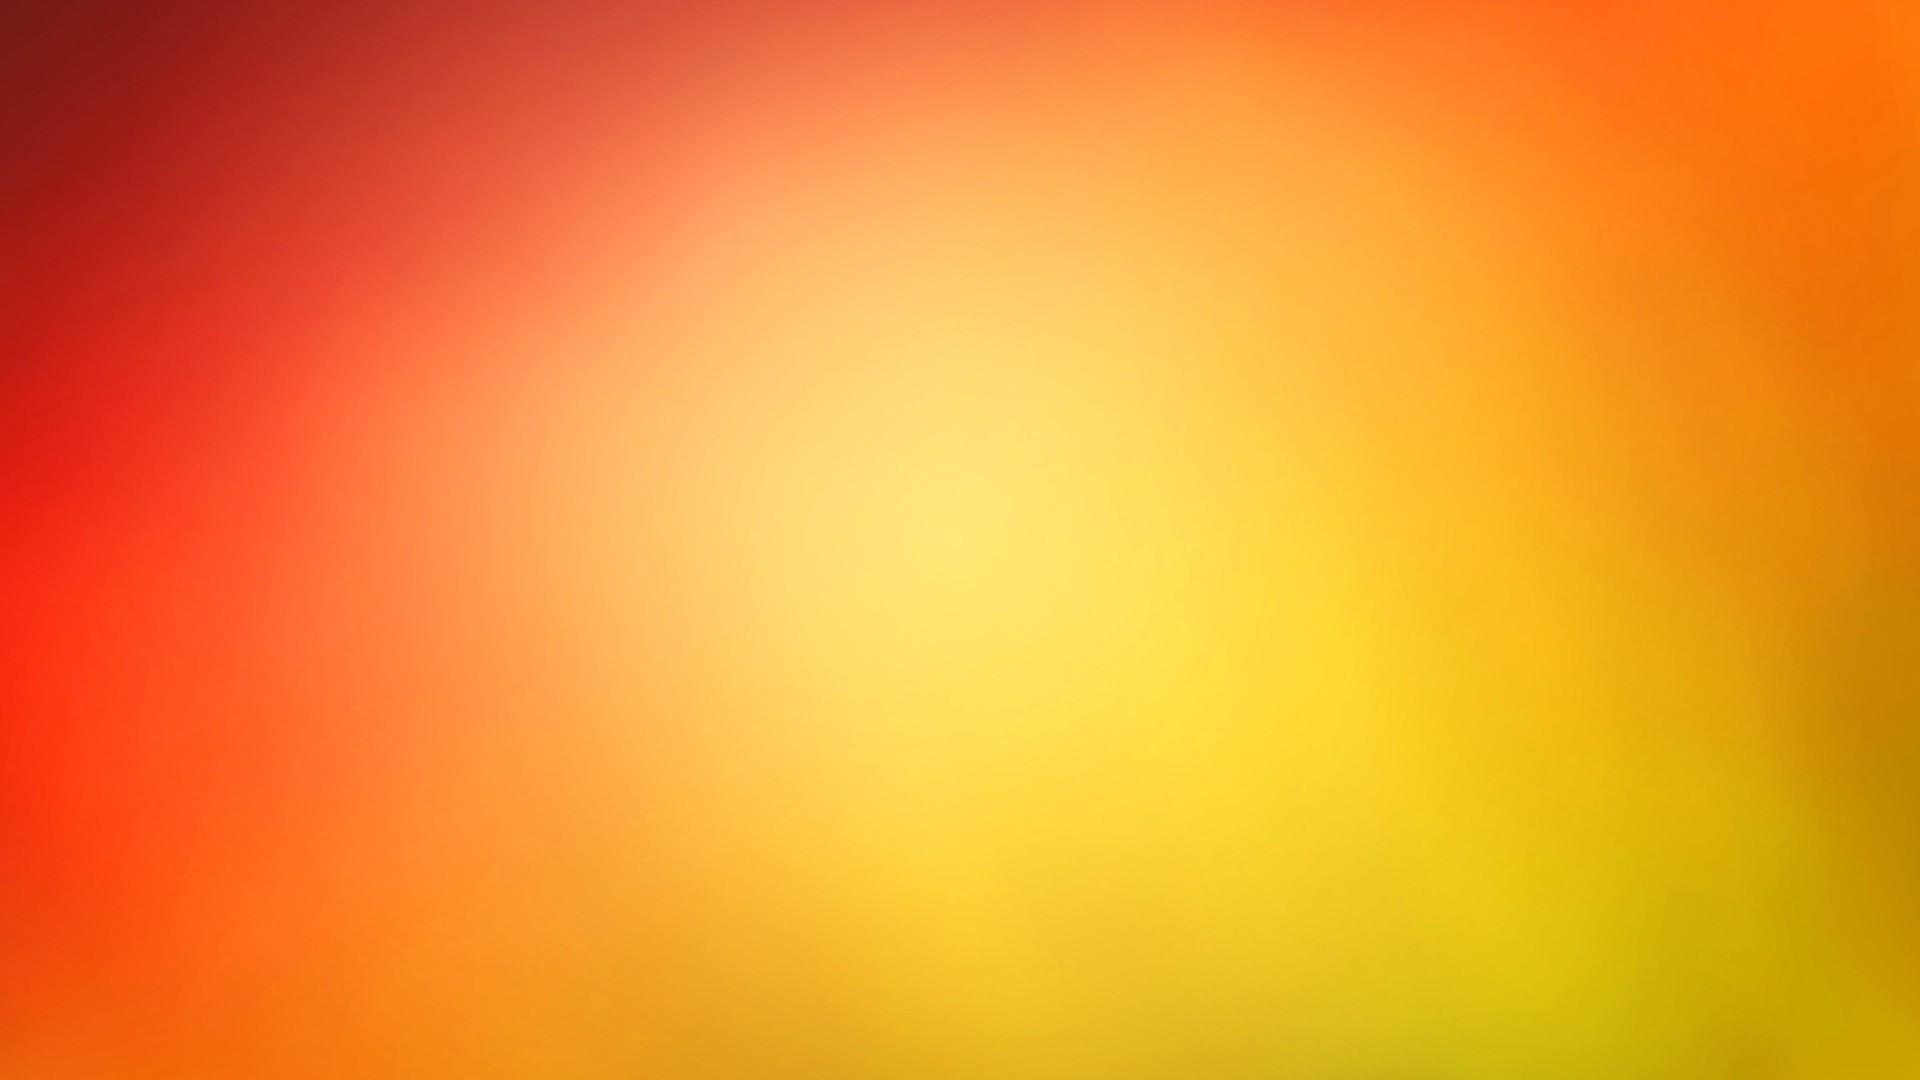 Light Color Image